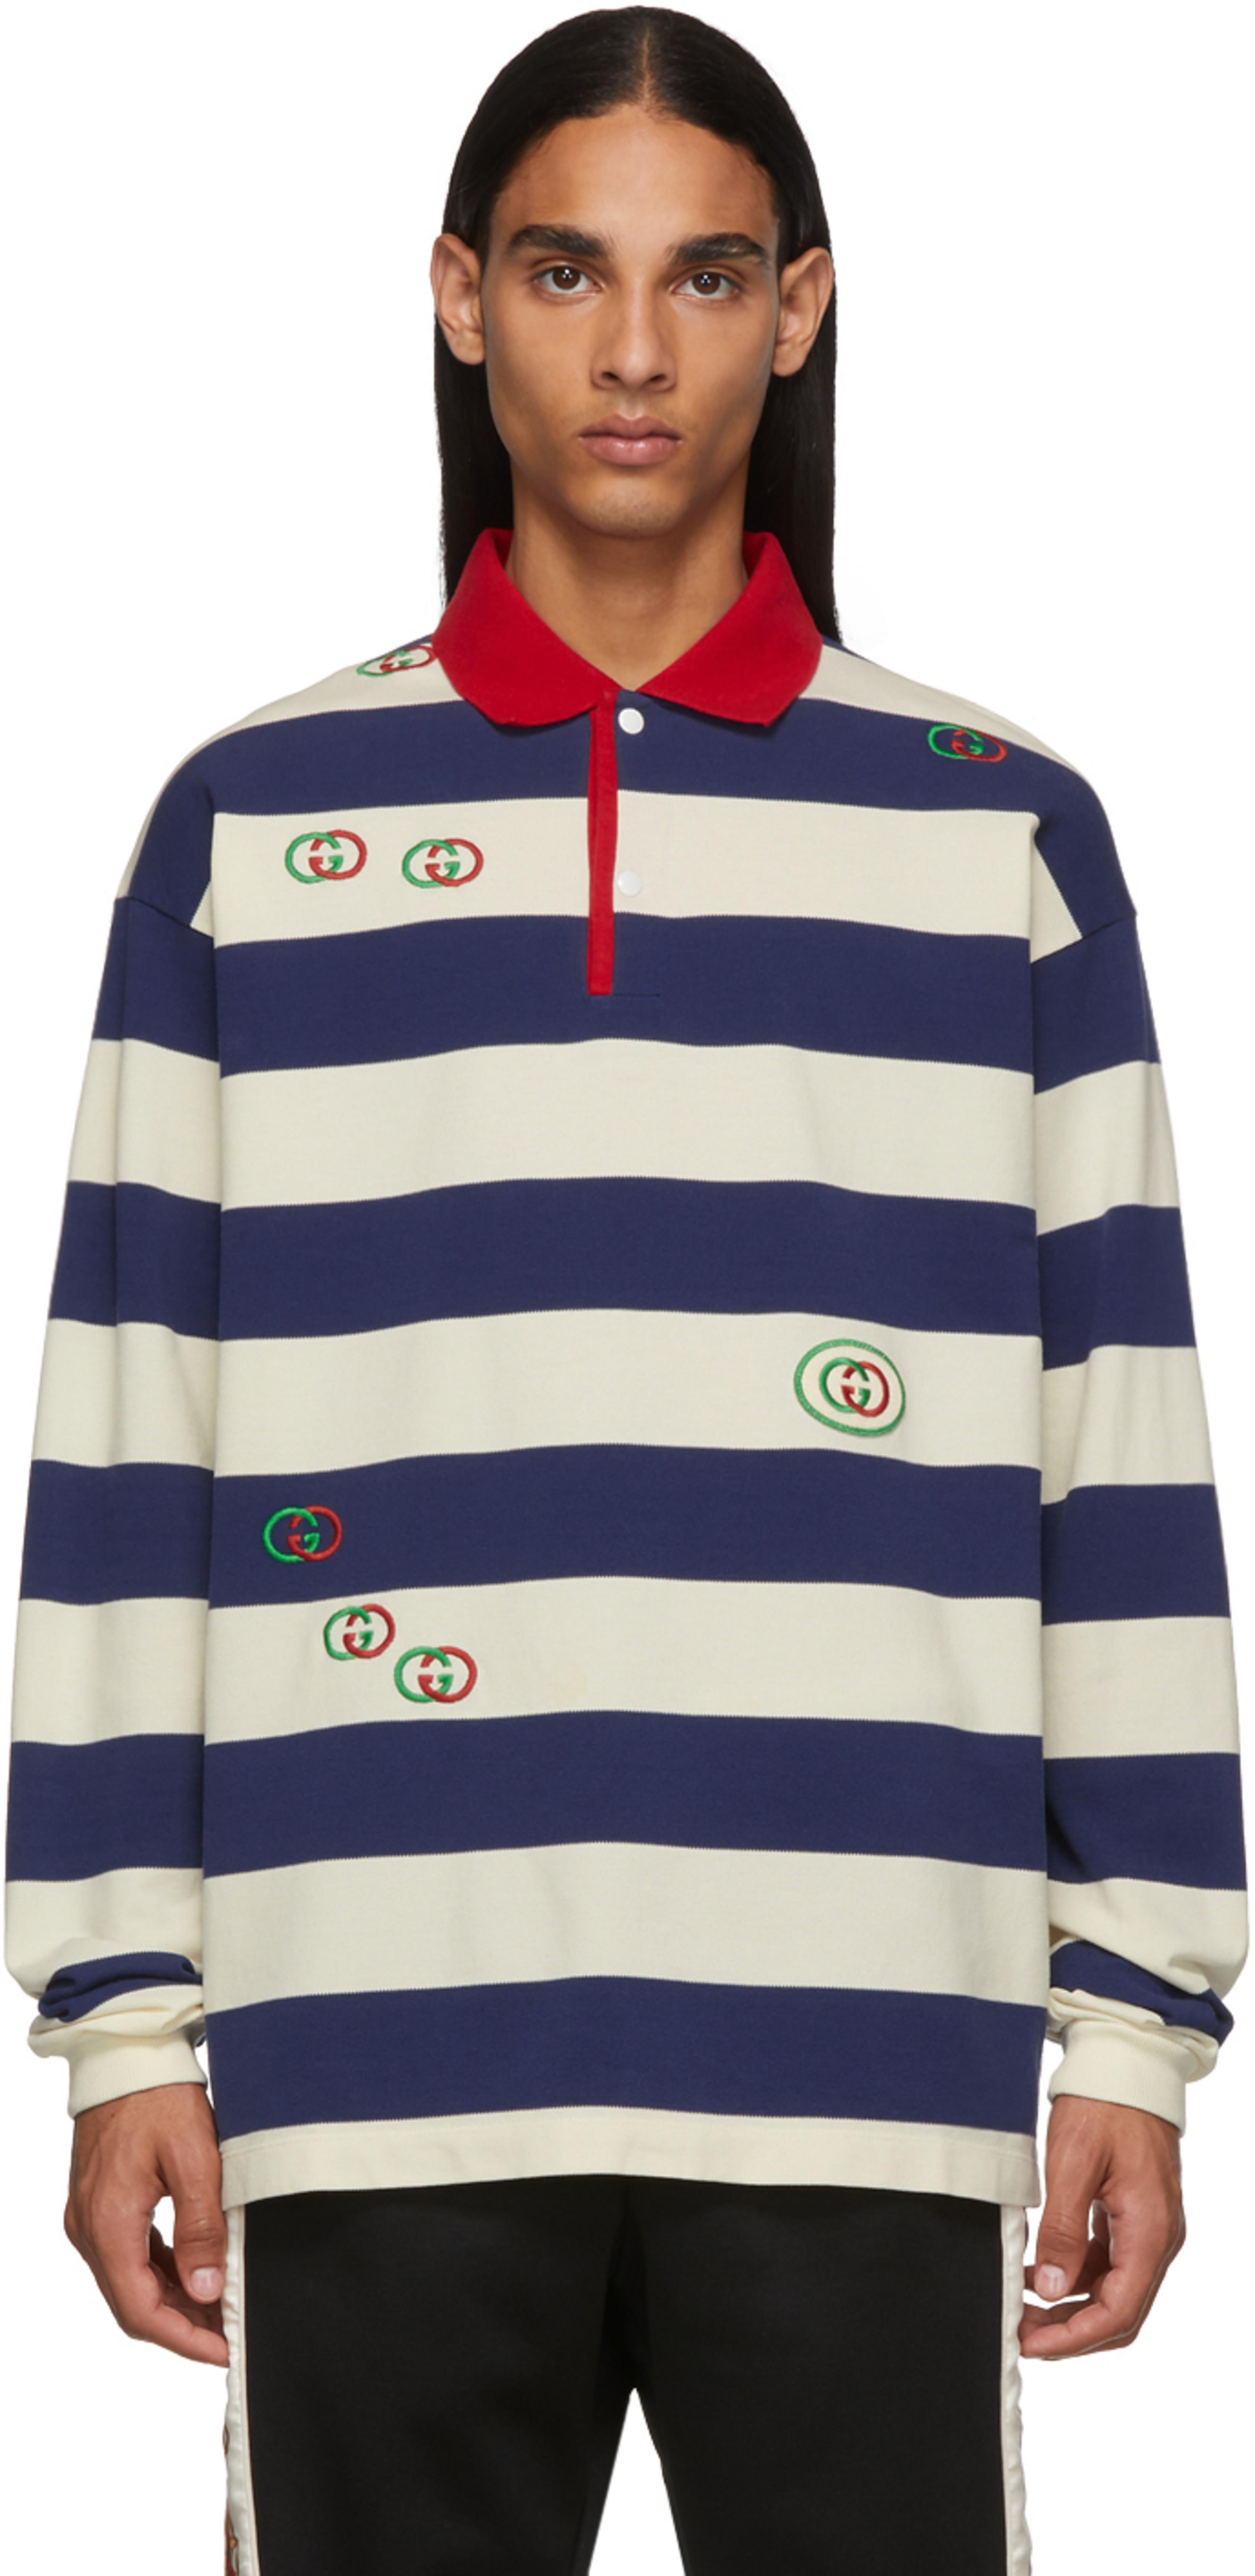 ca15e60ff020 Gucci for Men FW19 Collection | SSENSE UK